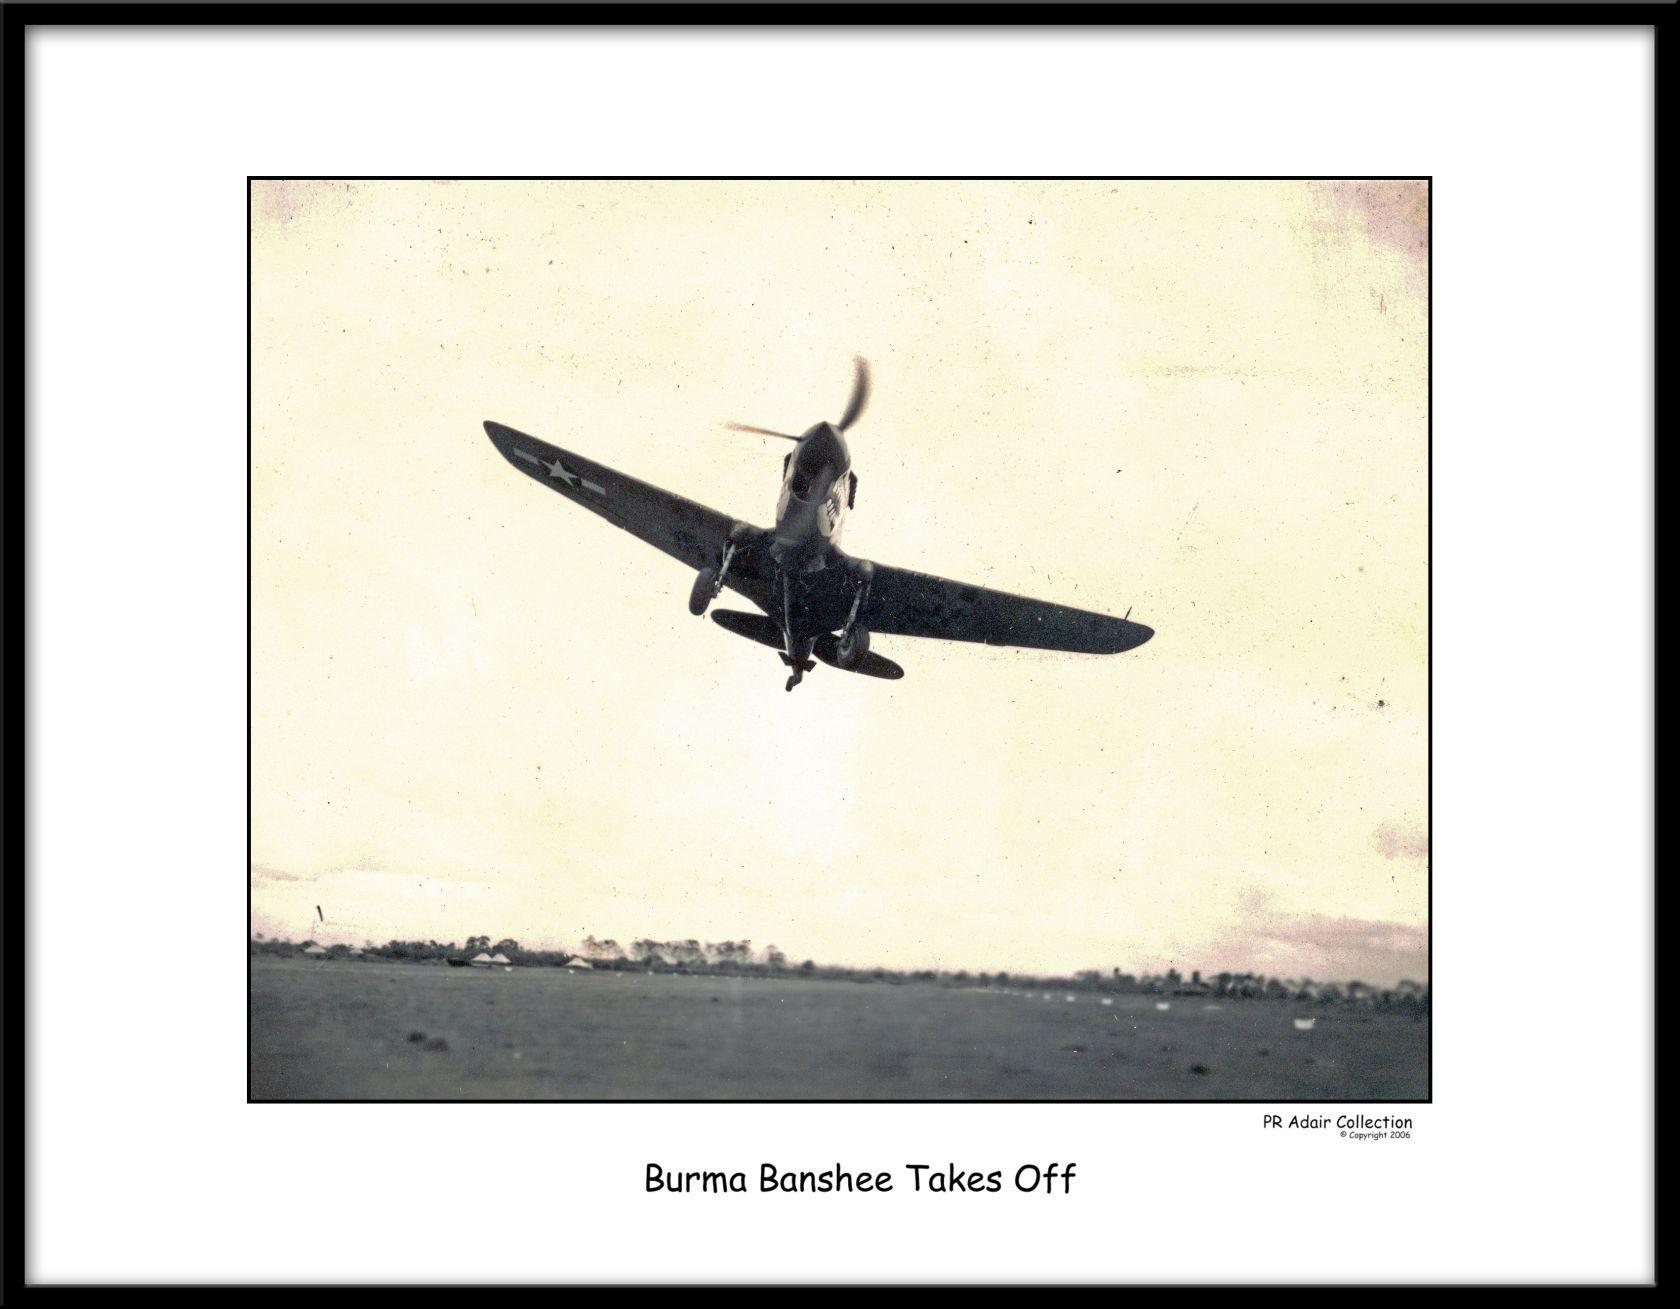 Burma Banshee 105